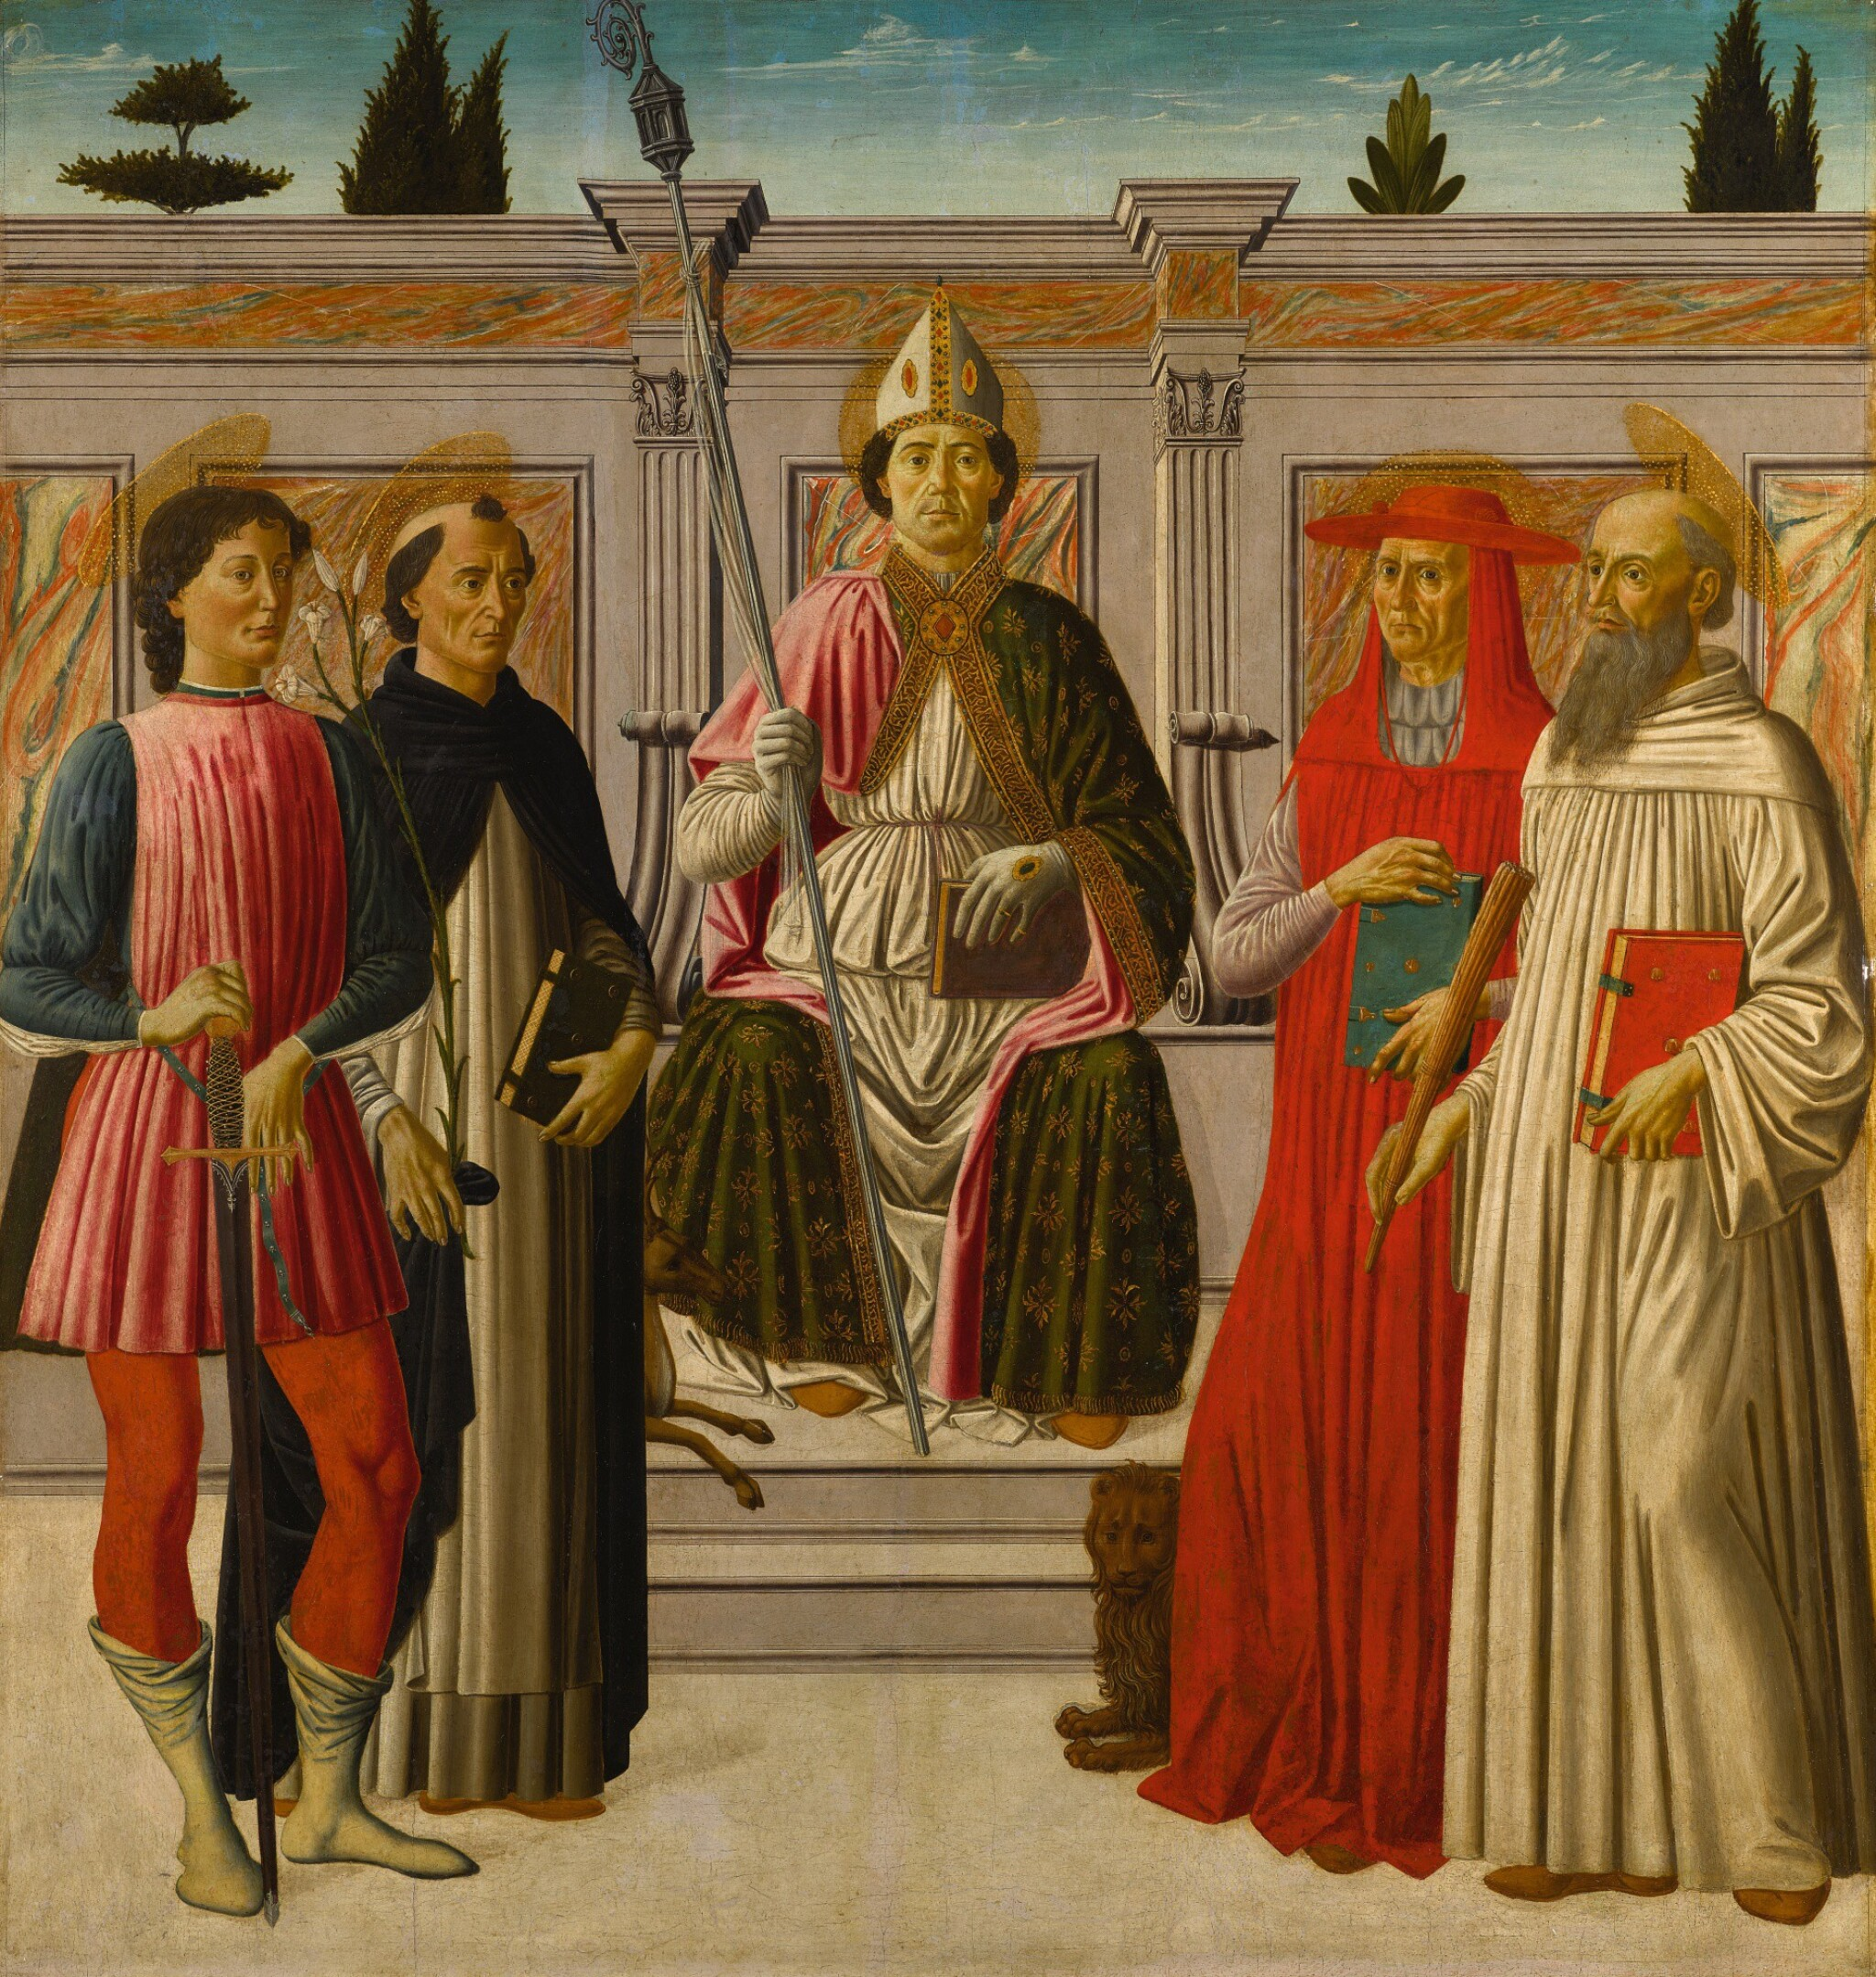 View 1 of Lot 6. FRANCESCO BOTTICINI   Saint Nicholas enthroned with Saints Hubert, Dominic, Jerome and Anthony of Padua   弗朗契斯科・波提其尼  《聖尼格老登位,聖胡伯、聖道明、聖傑羅姆與帕多瓦的聖安東尼在旁》.